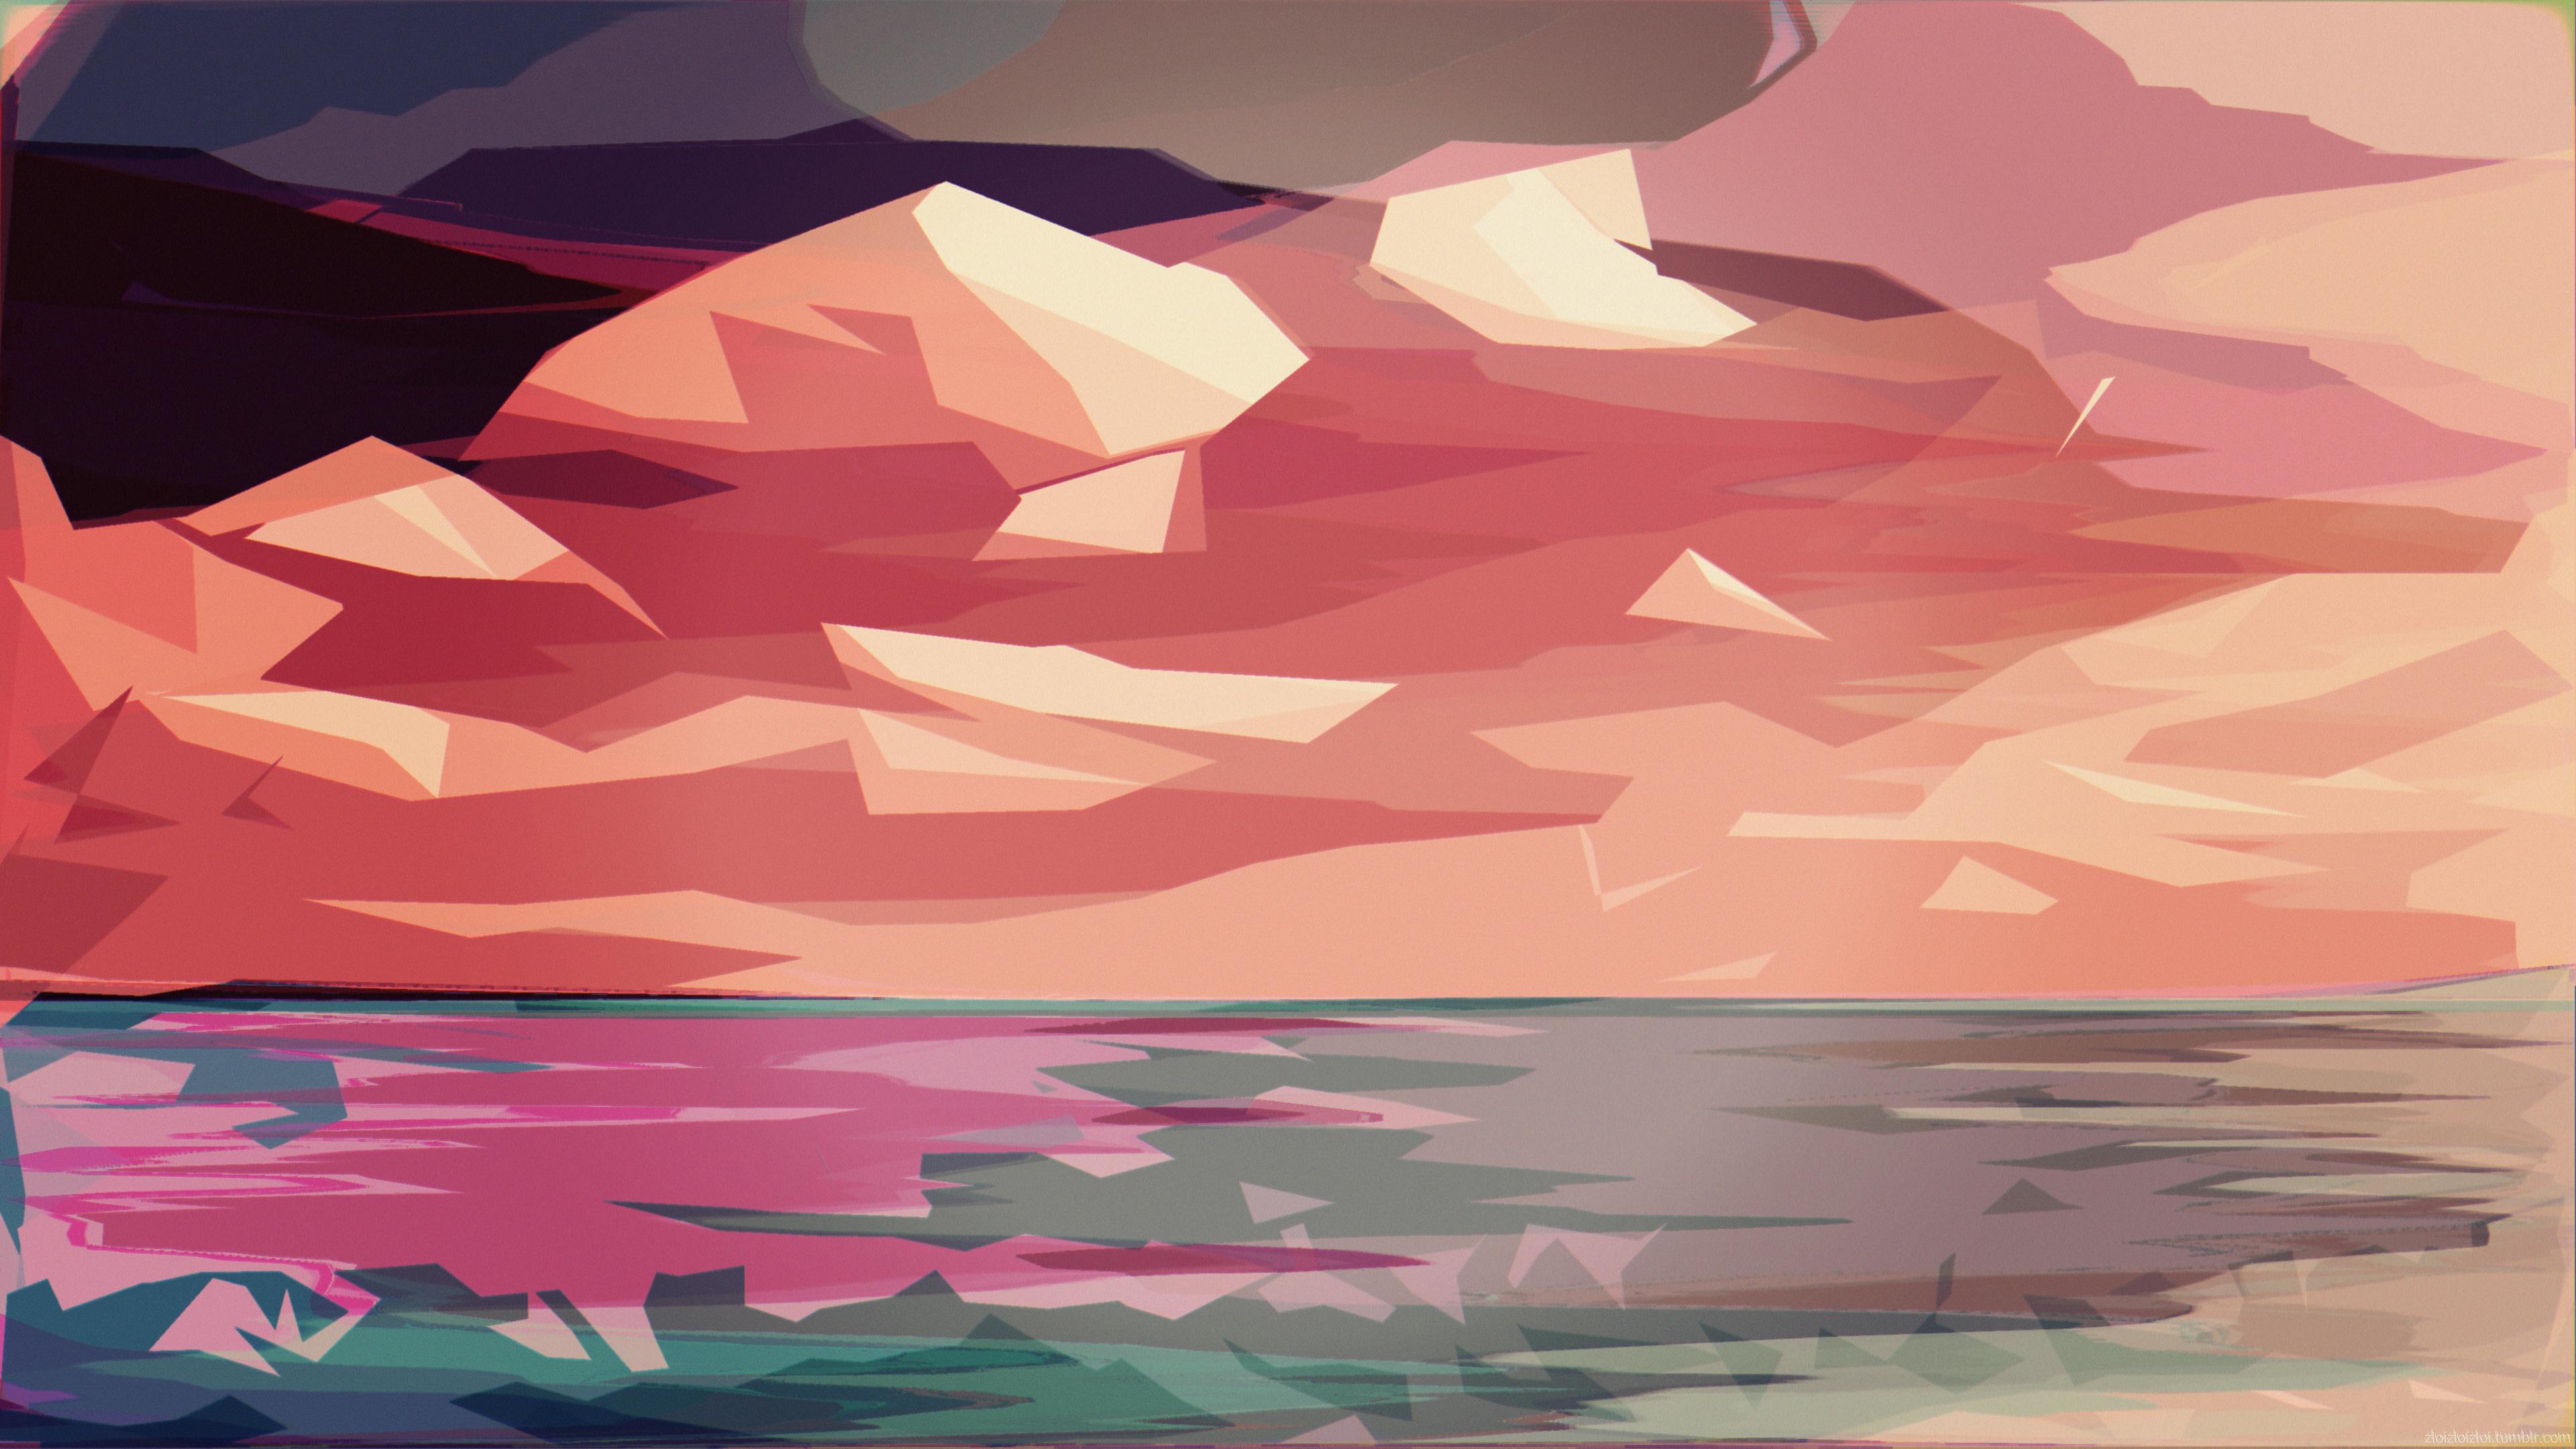 Polygon Art Abstract 4k, HD Abstract, 4k Wallpapers ...